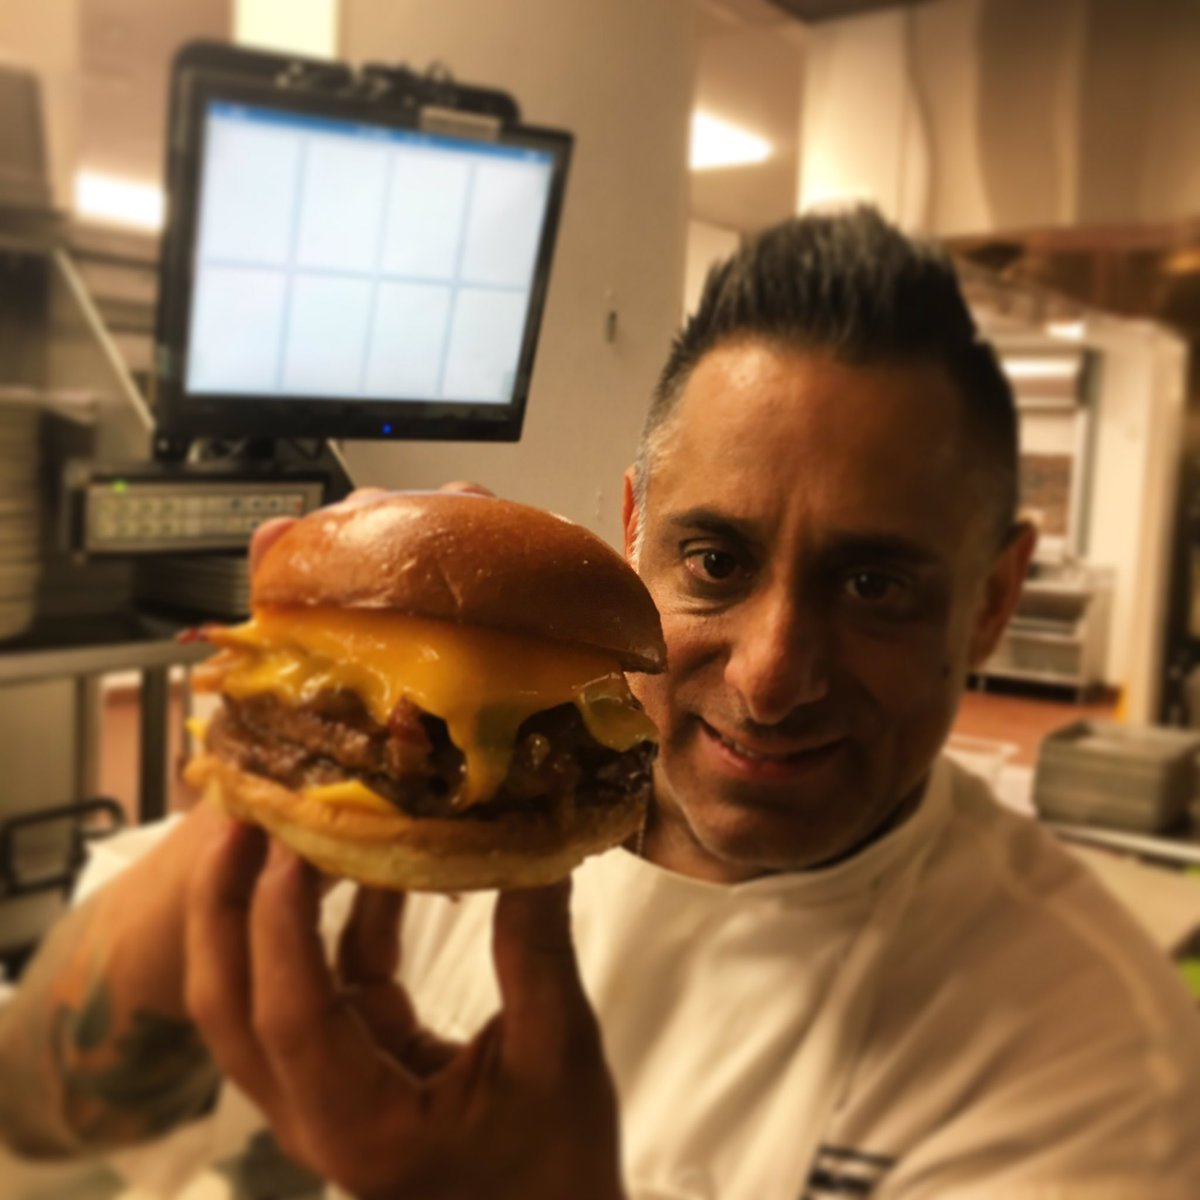 Doing what we do ~Burger Time Sammy's Double House Burger @SammyDsAC @harrahsresort @savetheworld82 @billyfreeze13 https://t.co/UHOl26nHSC